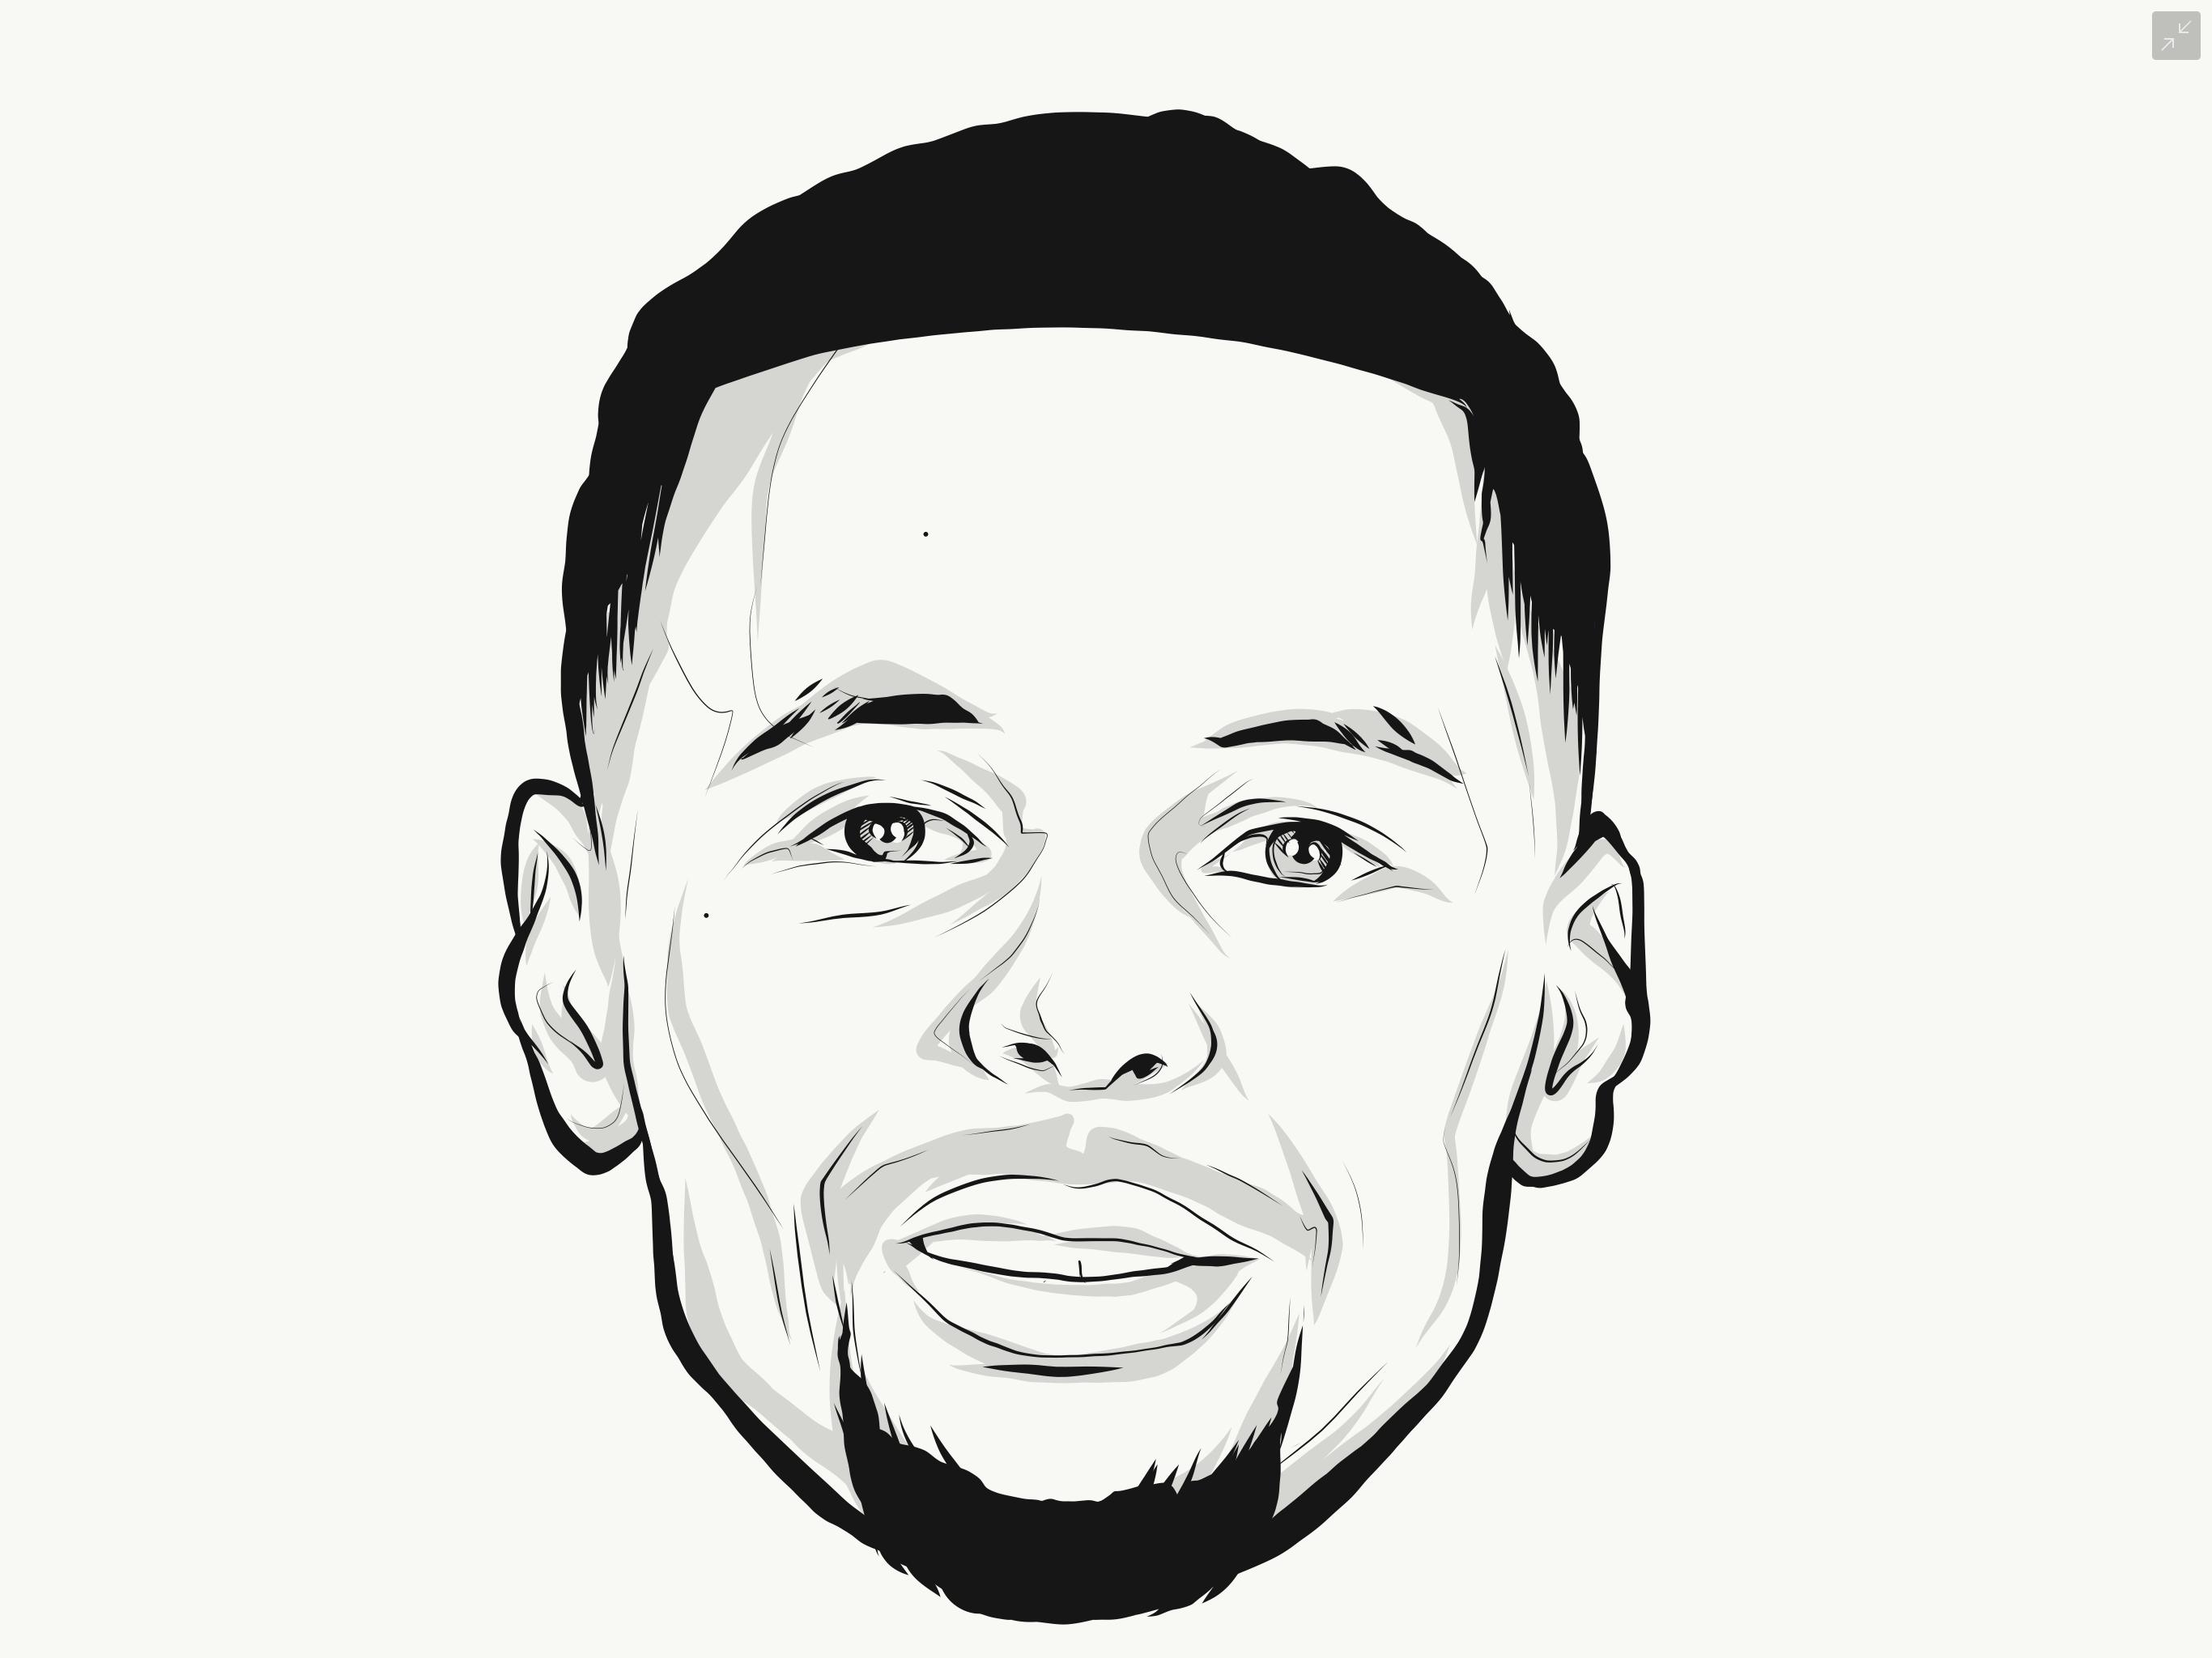 2732x2048 Warriors Fan Night Illustrations Golden State Warriors